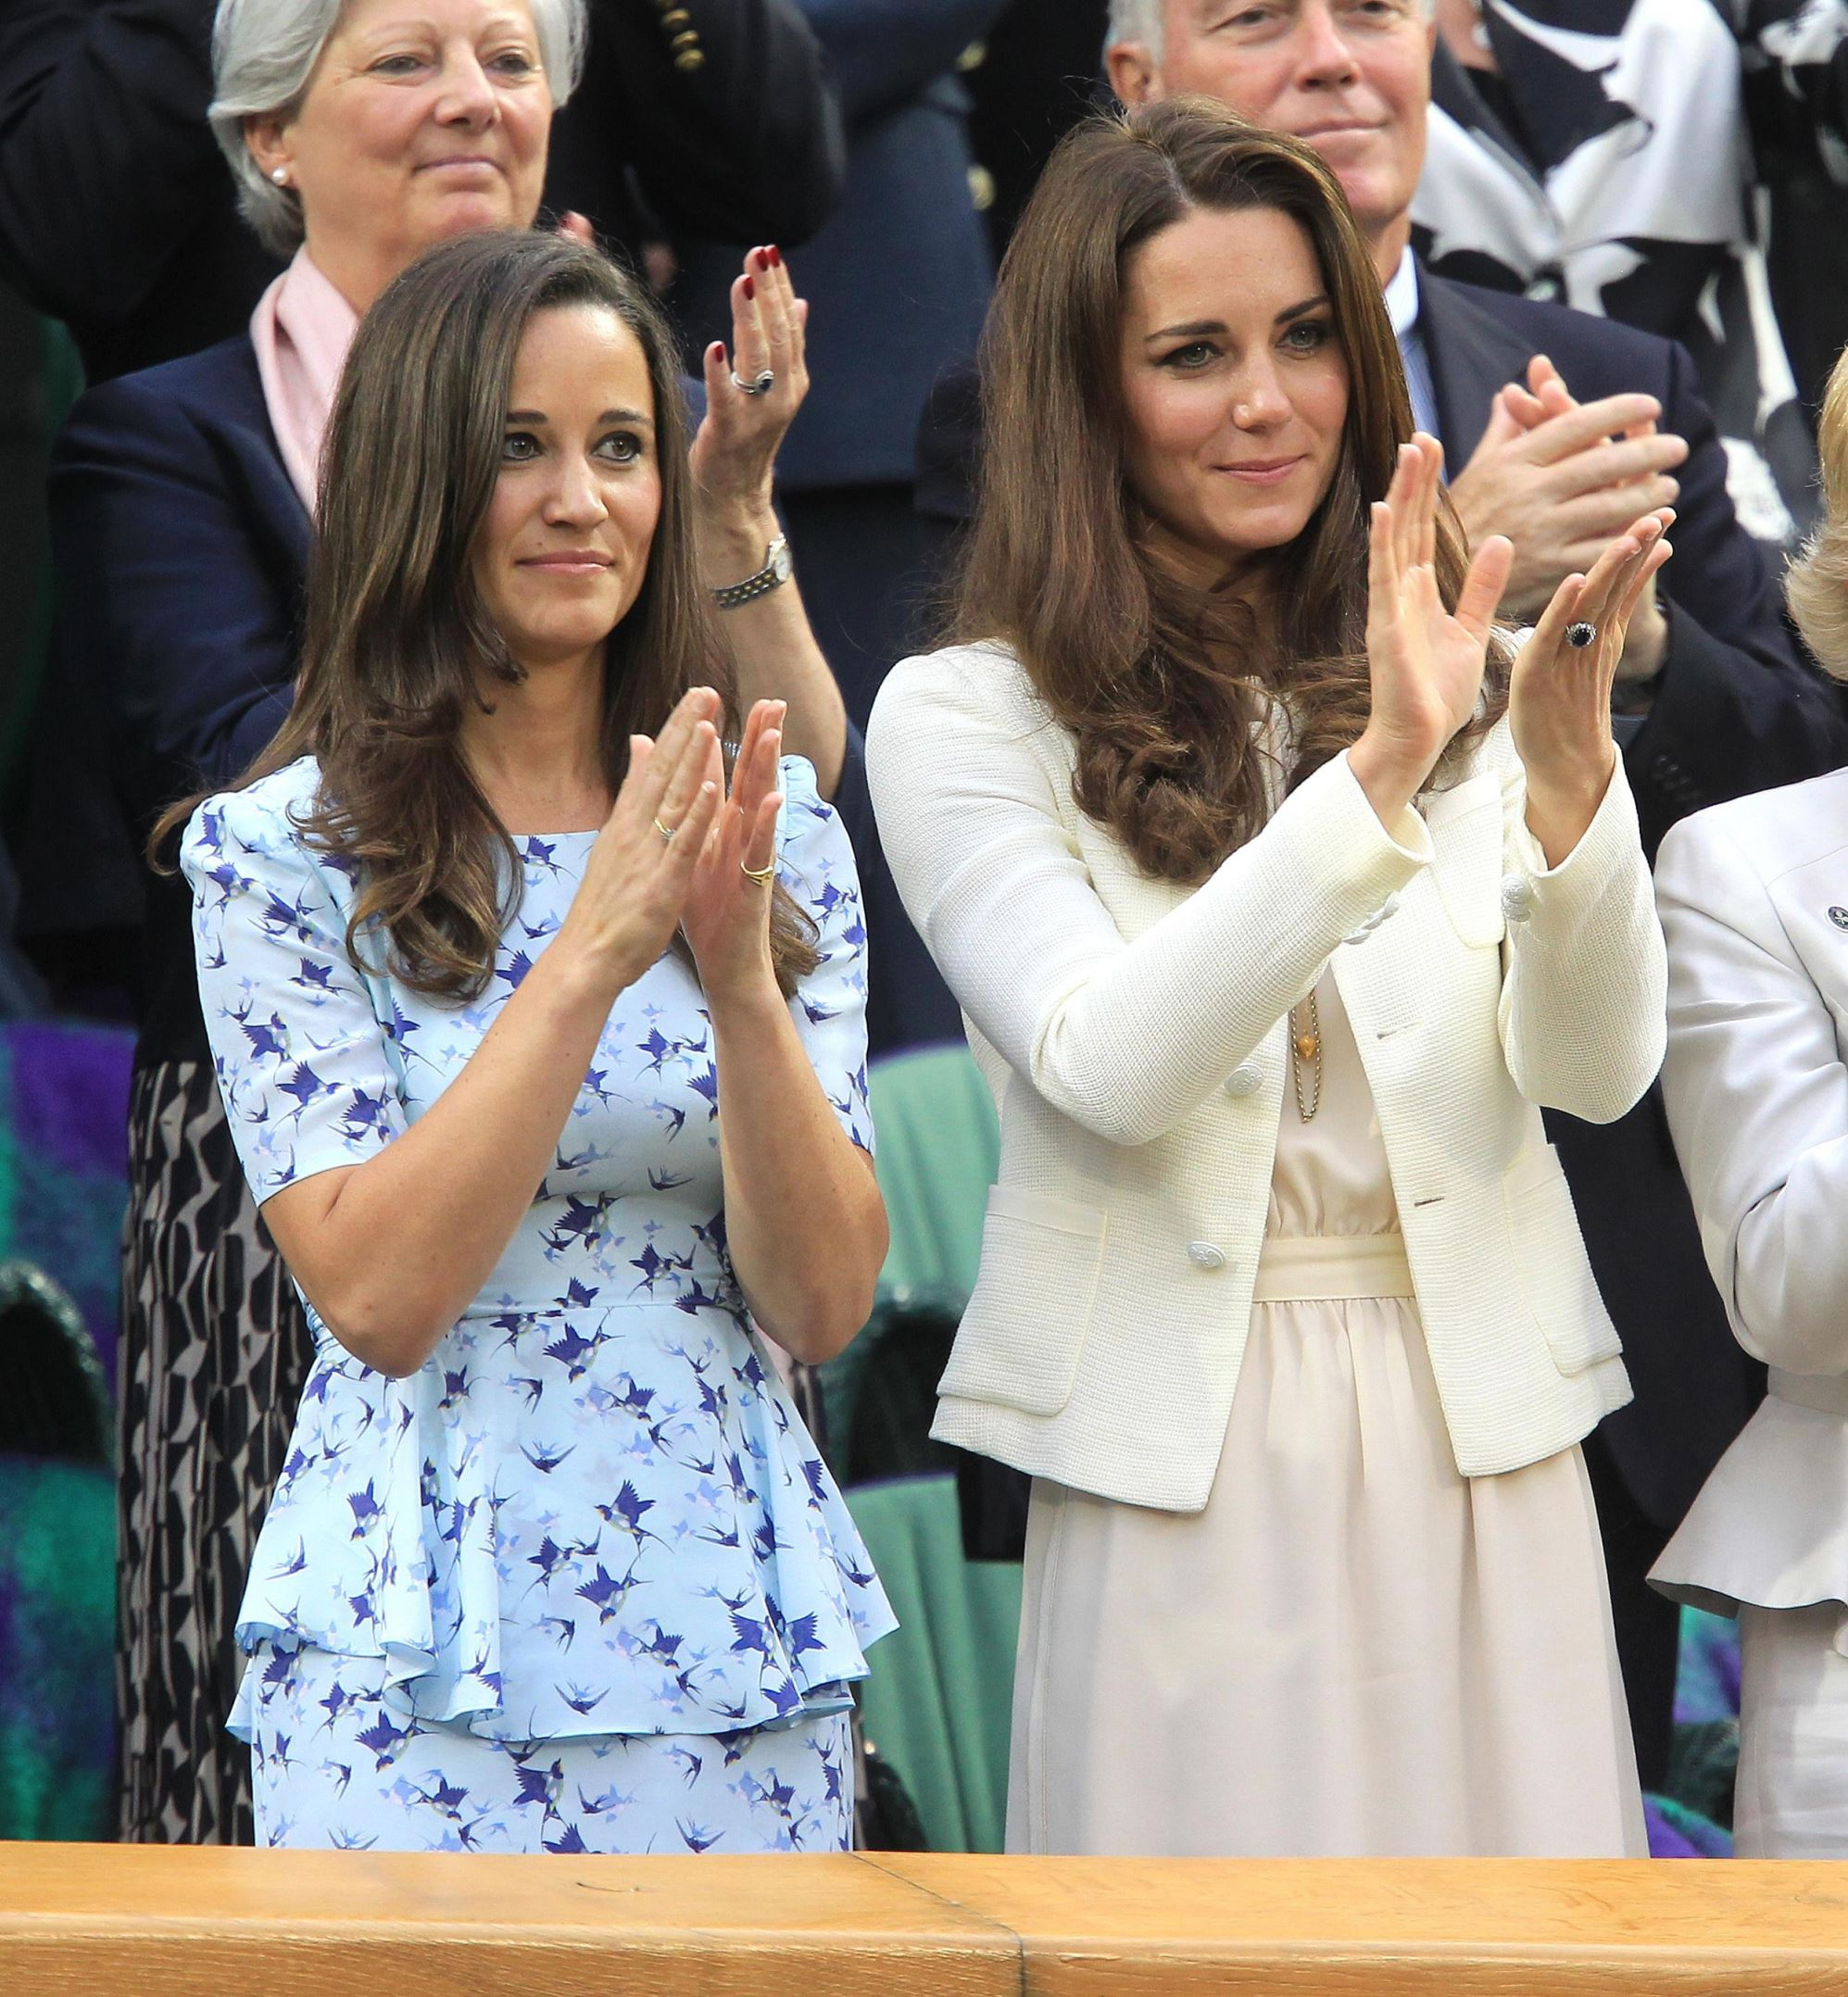 Pippa Middleton incontri 2013